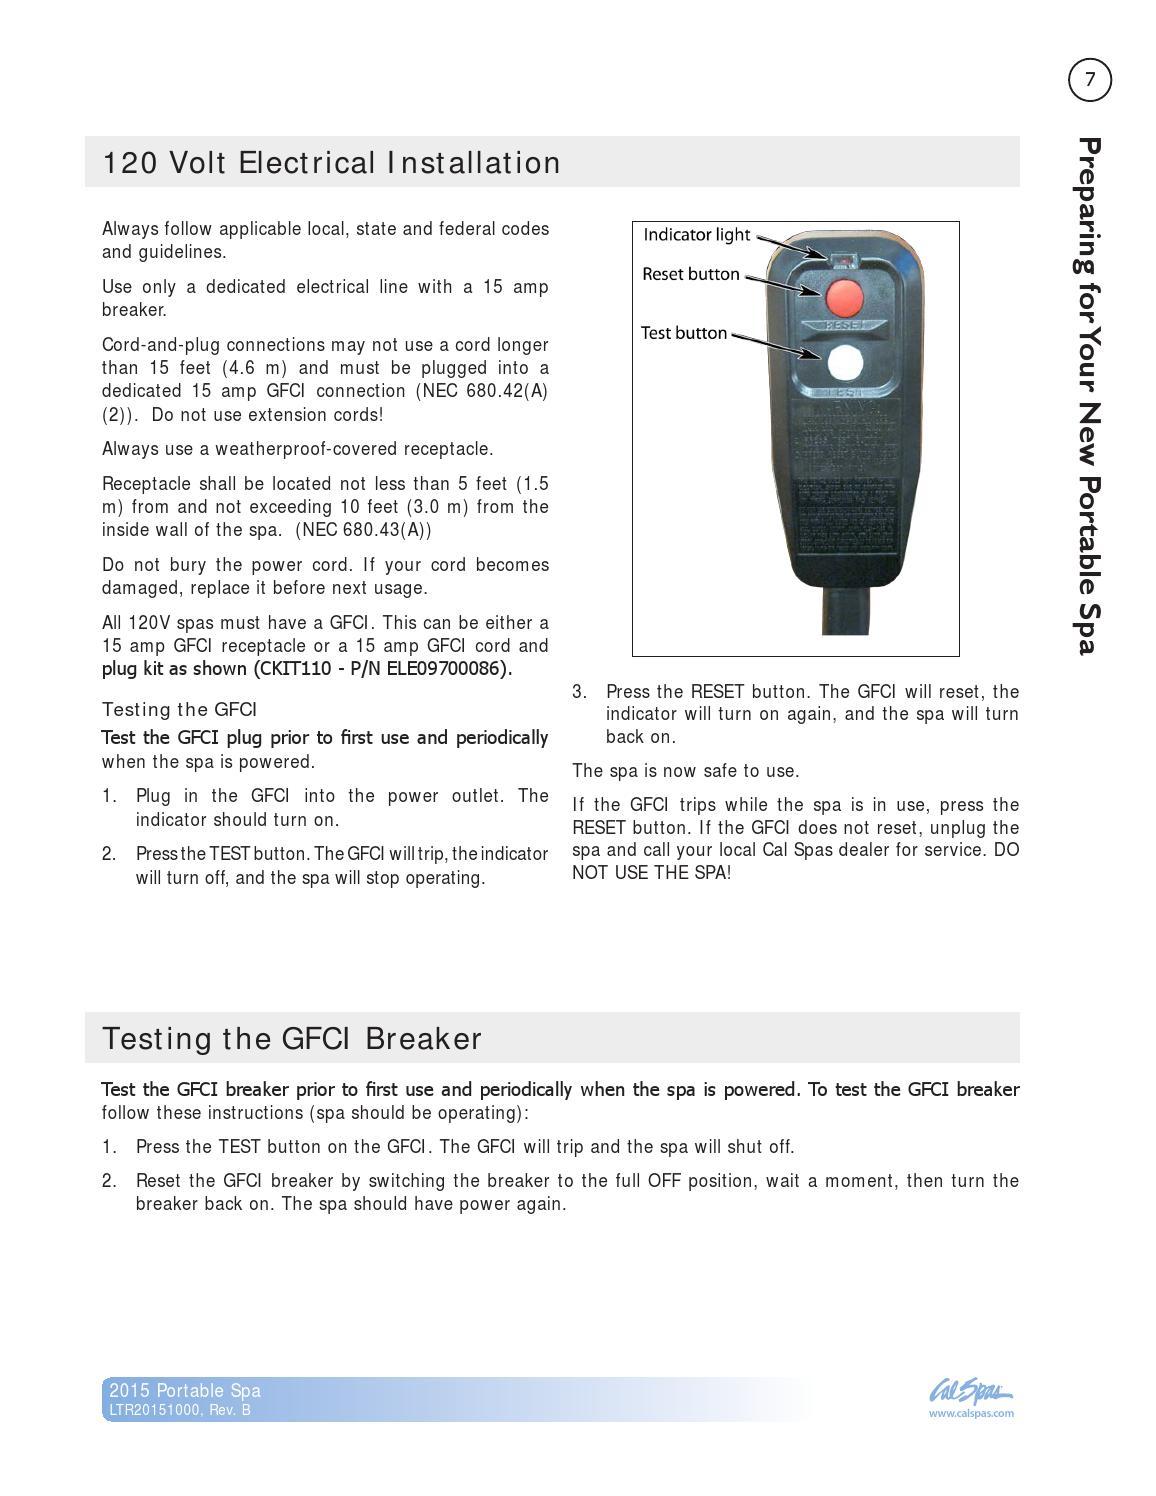 2015 Spa Owner's Manual